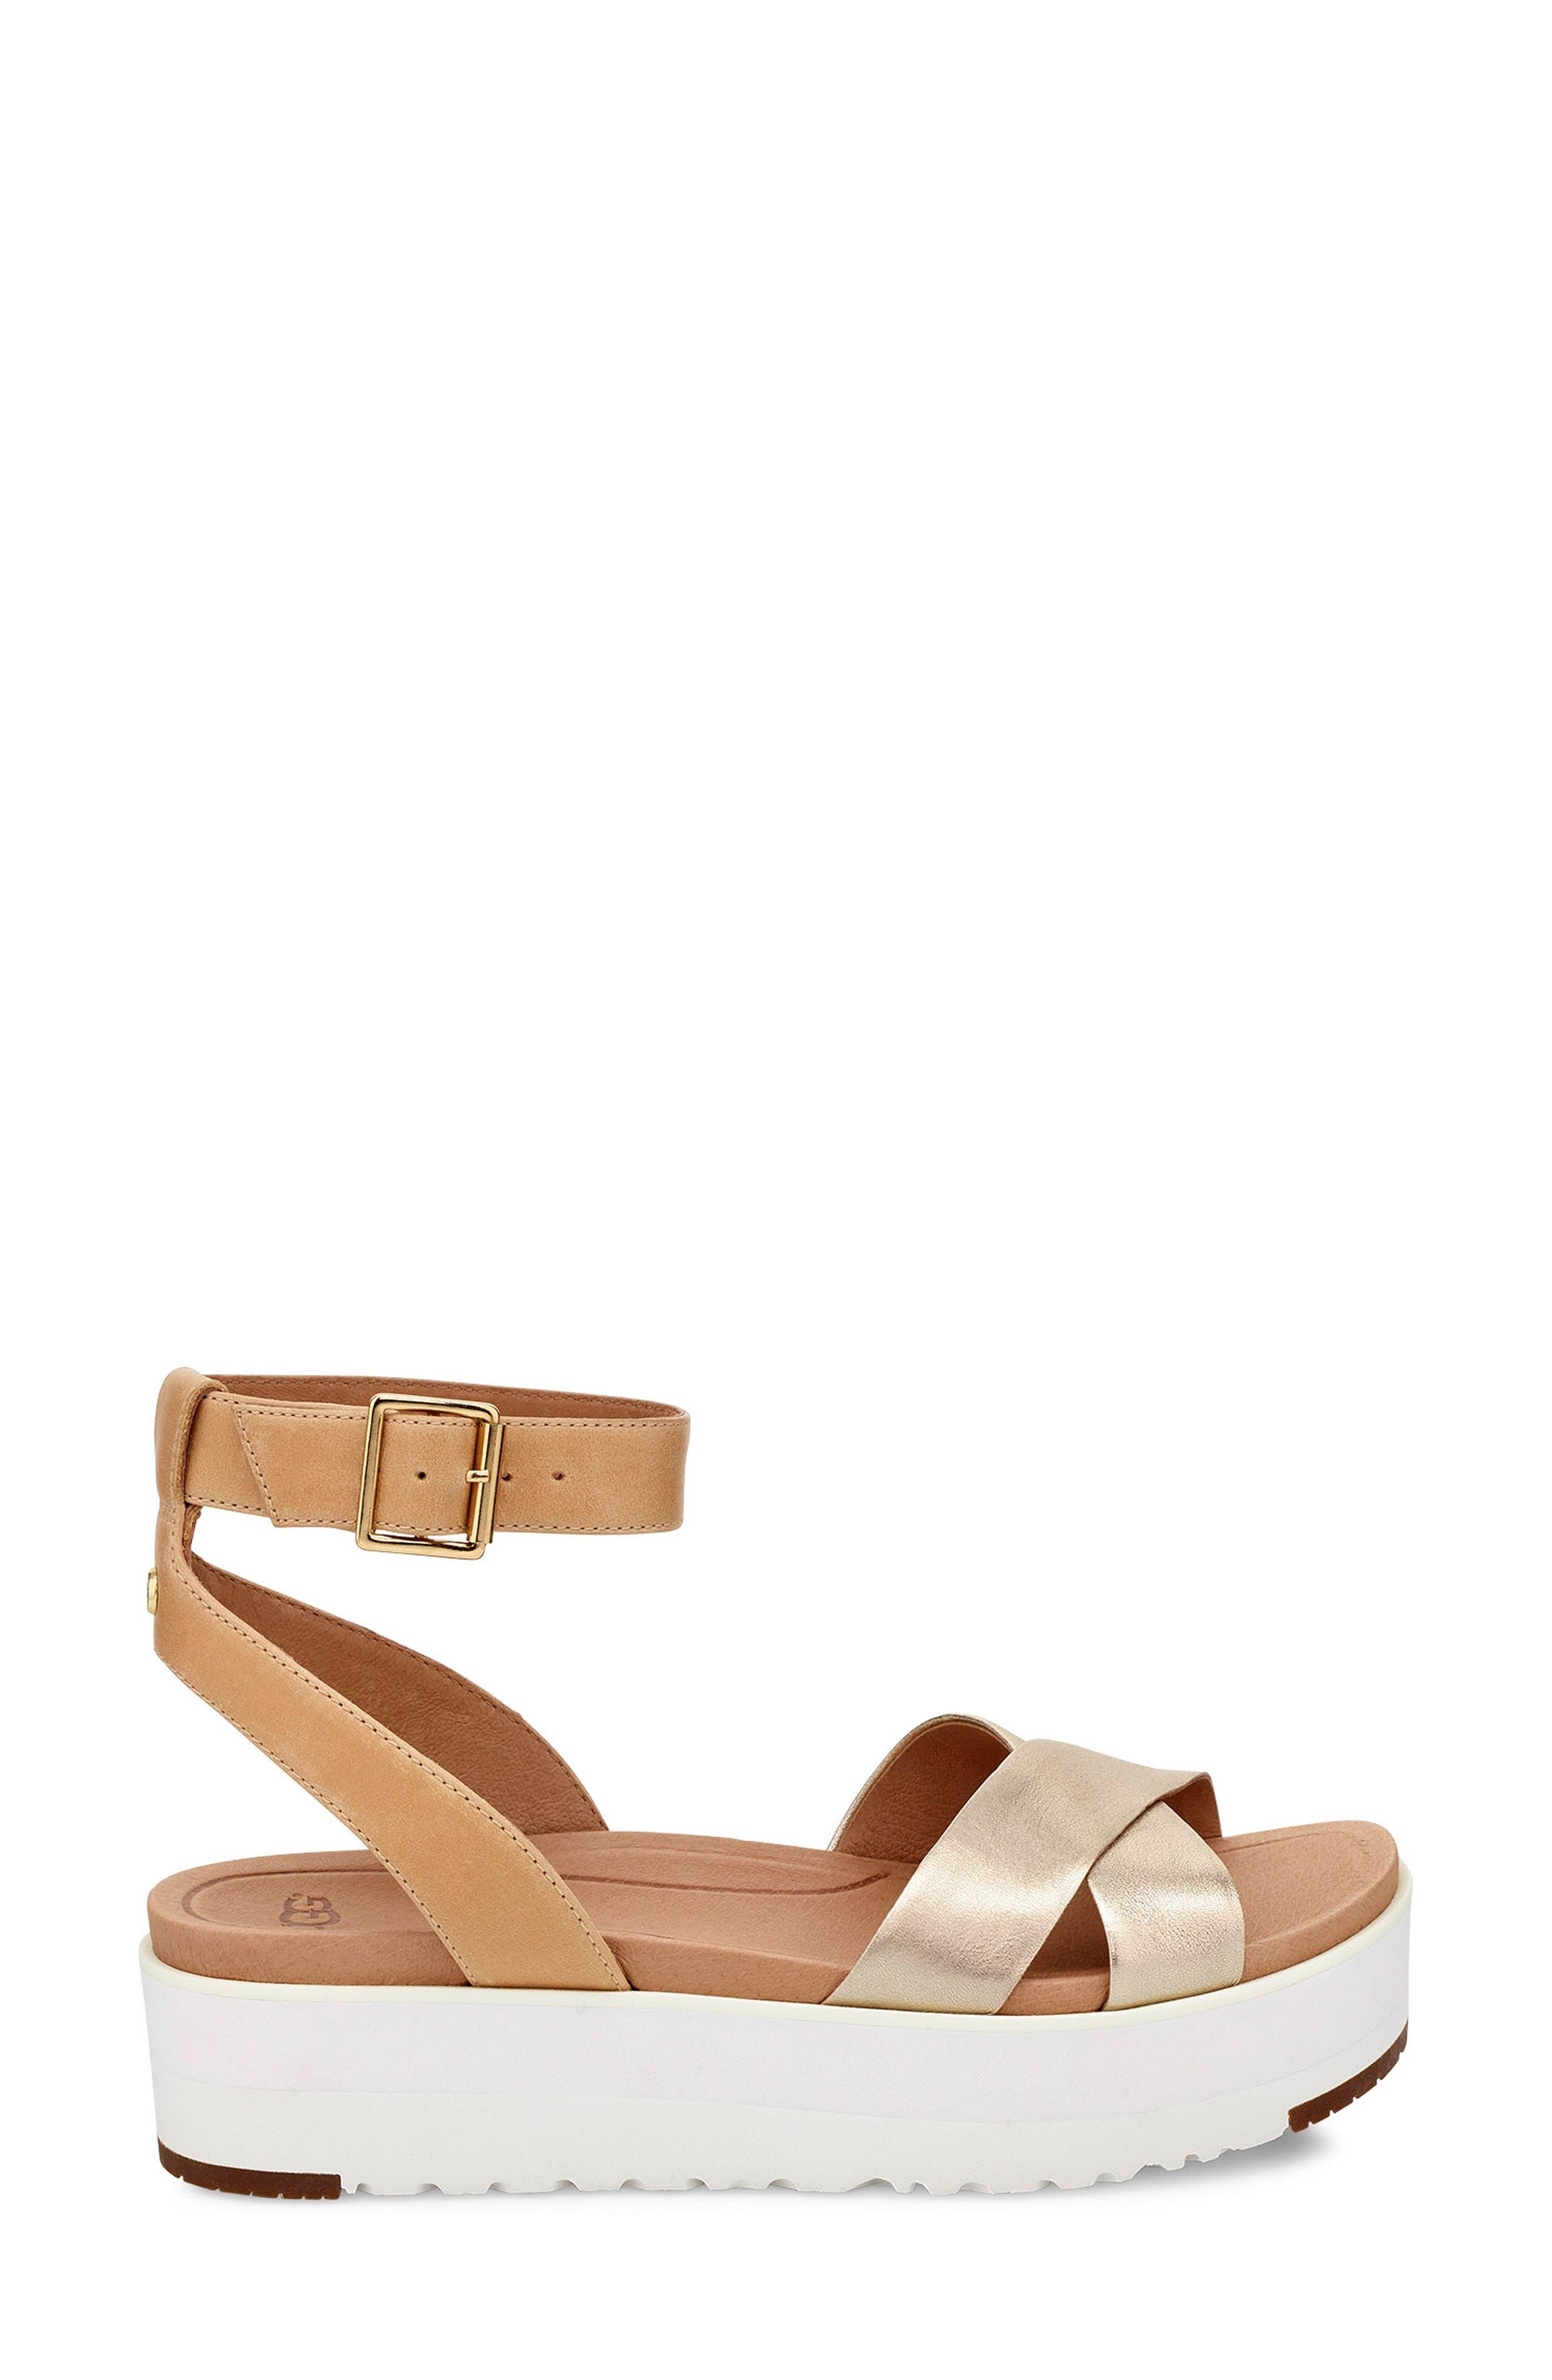 Tipton Metallic Platform Sandal,                             Alternate thumbnail 3, color,                             GOLD